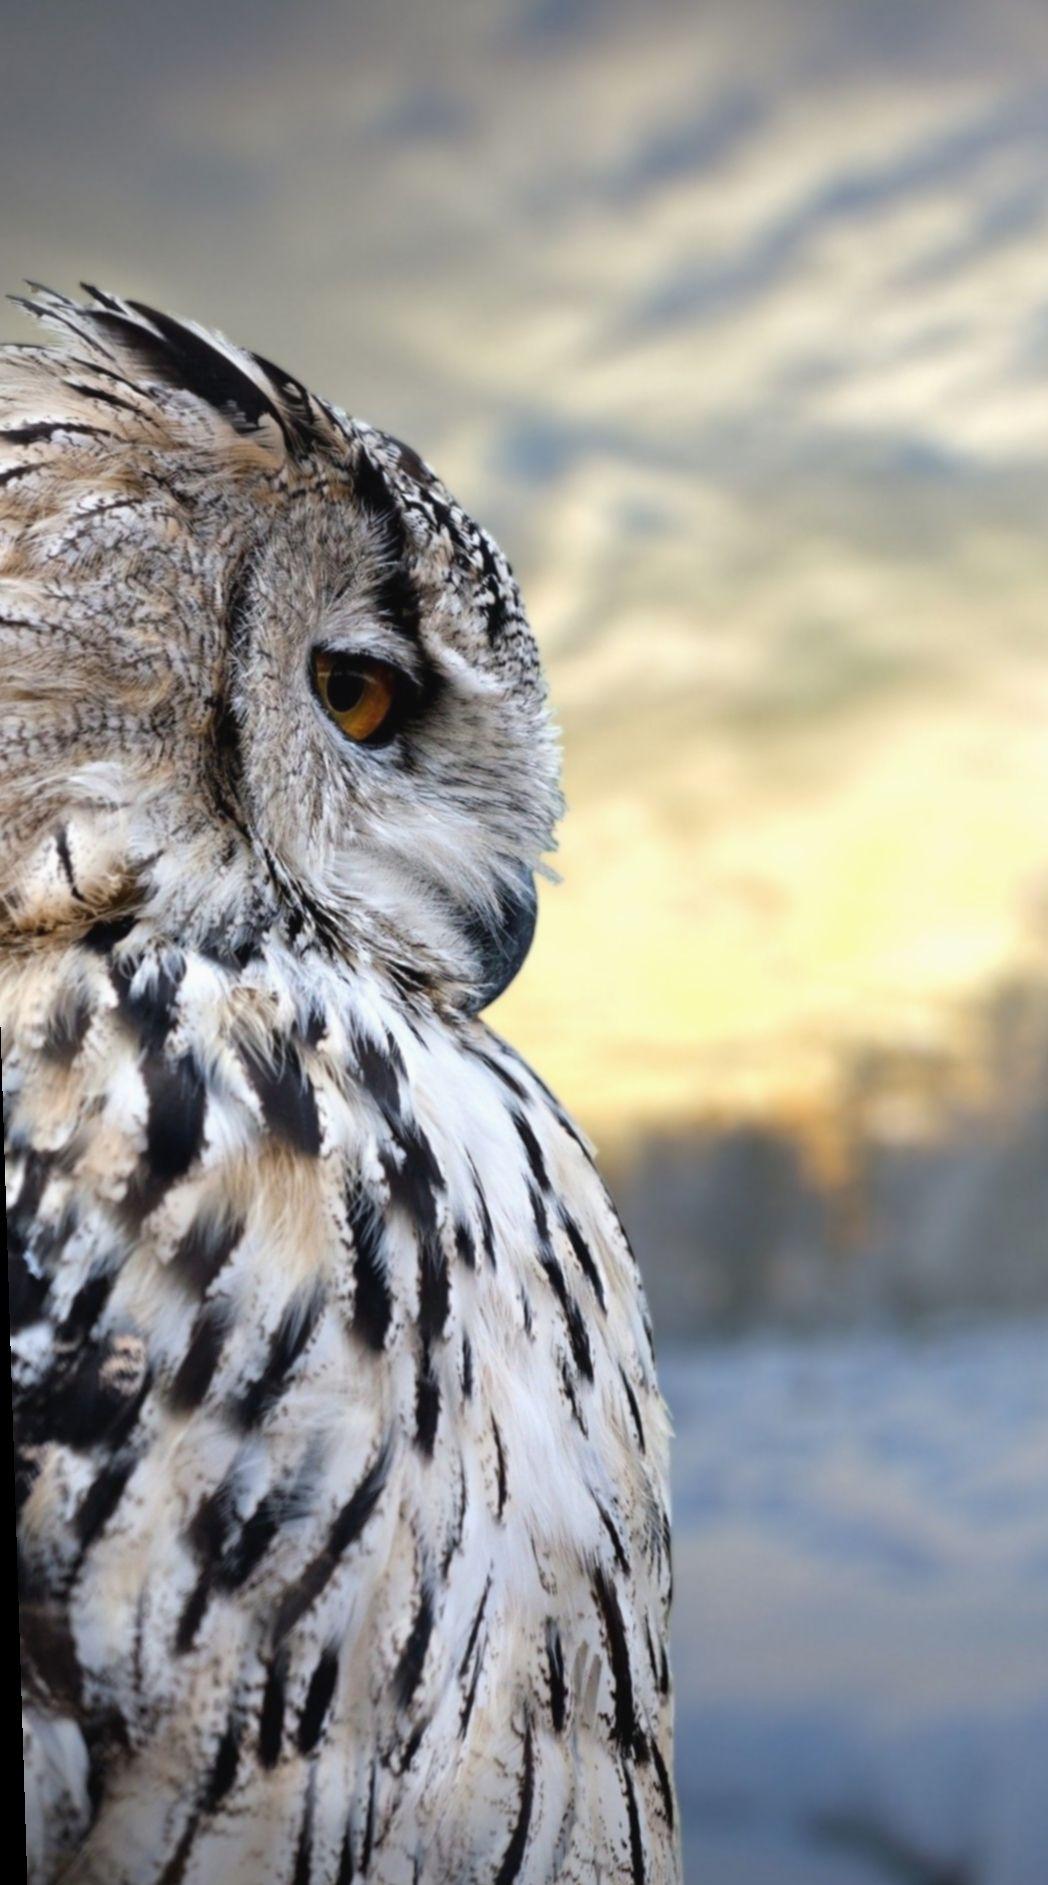 Cute Animals Wallpapers Laptop Aderitacristina Miniensaio Miniensaiodiadascriancas In 2020 Owl Wallpaper Owl Owl Pictures